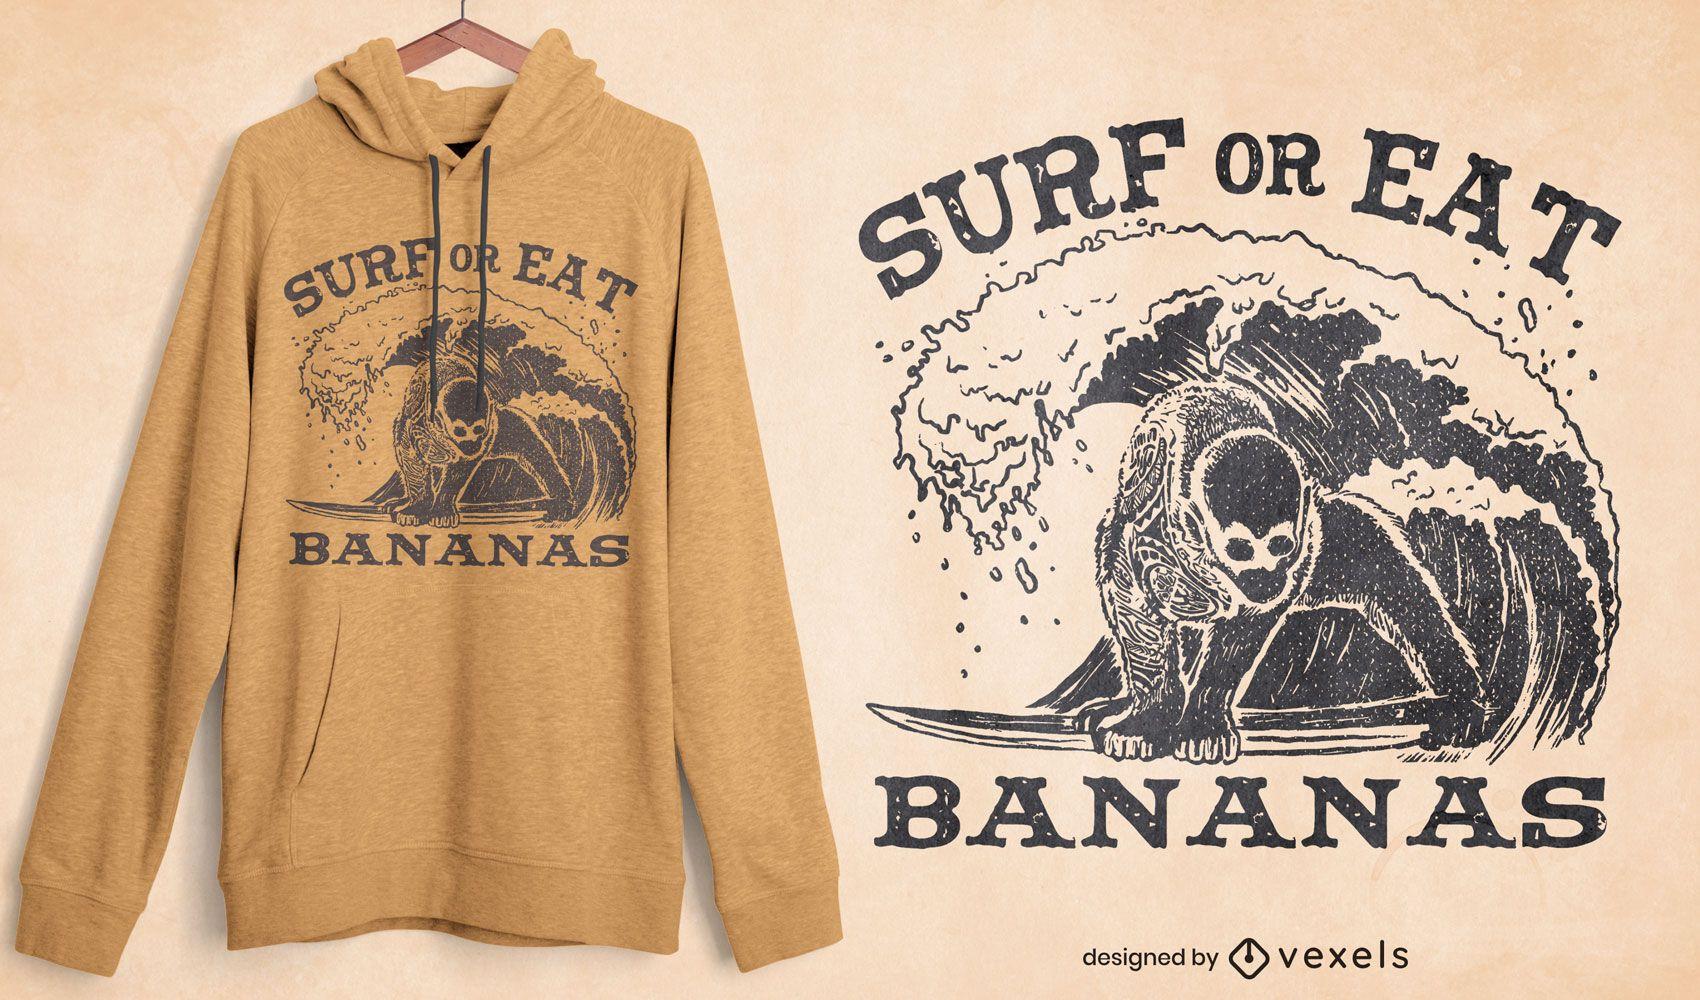 Surf or eat bananas t-shirt design